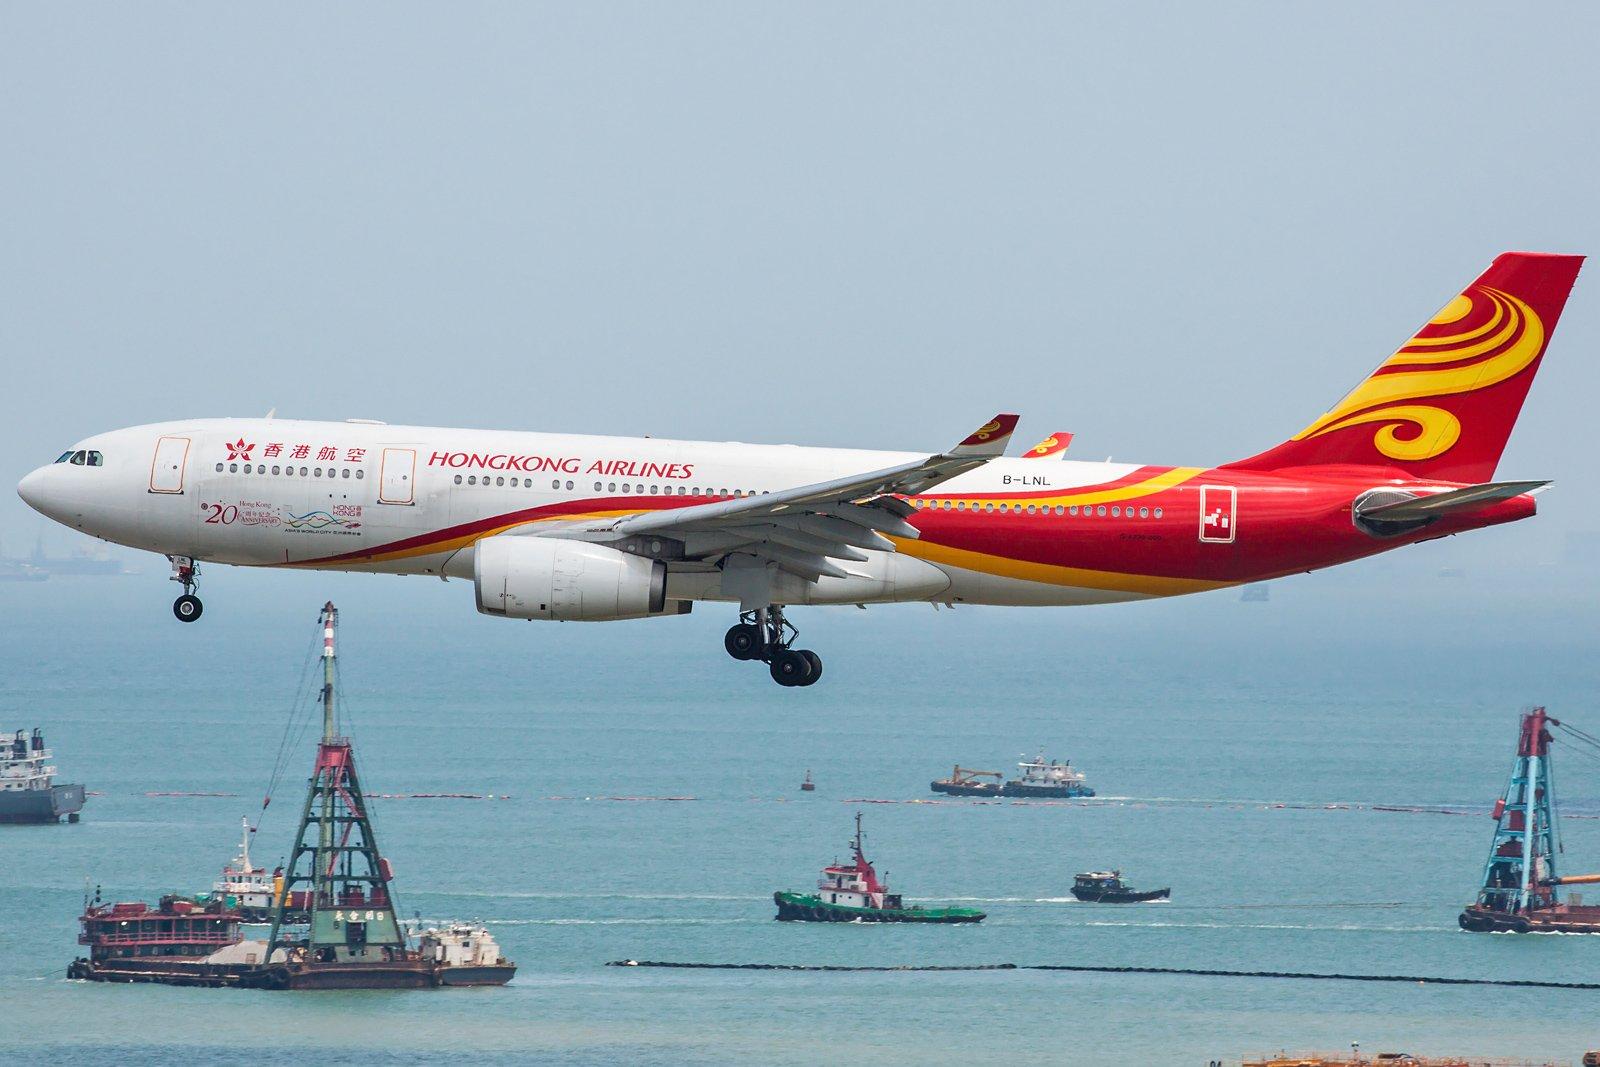 Hong Kong Airlines Airbus A330-243 B-LNL